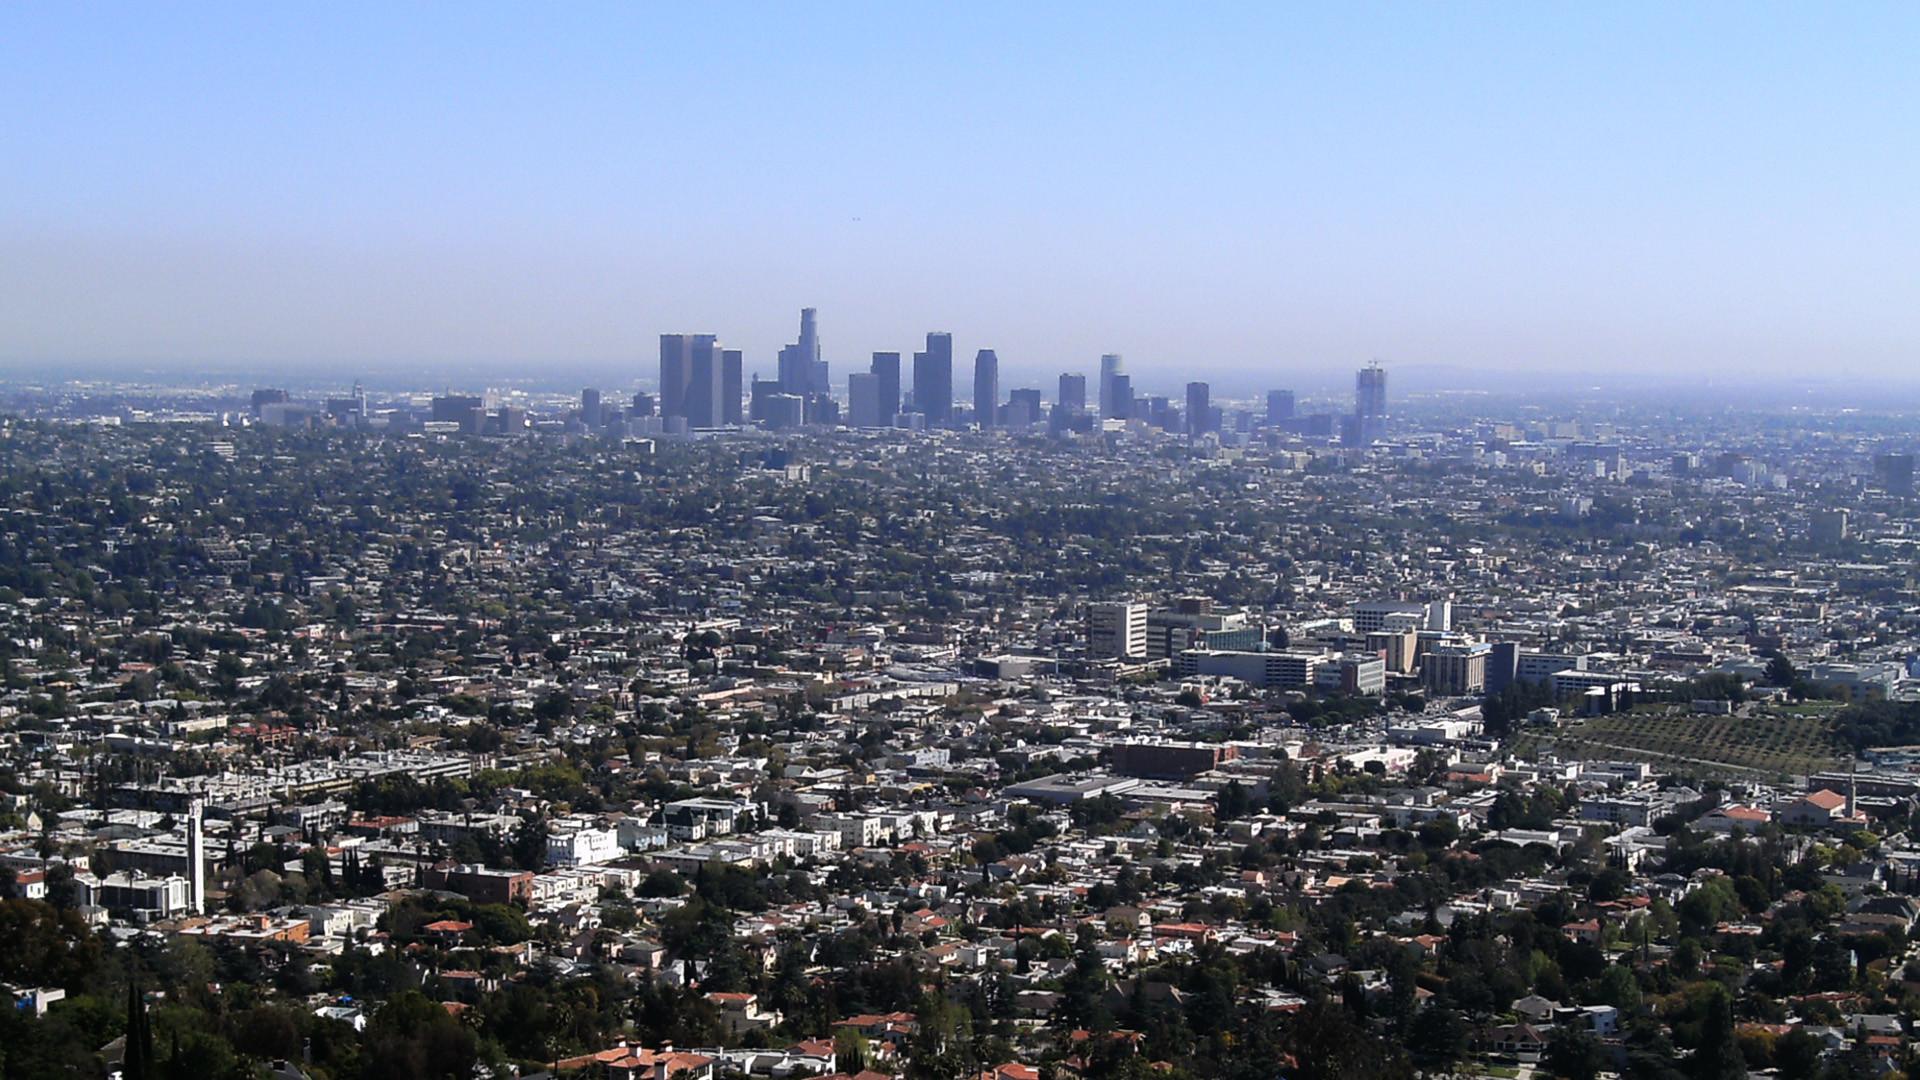 HD de Los Angeles Dodgers   Fondos de pantalla de Los Angeles Dodgers .